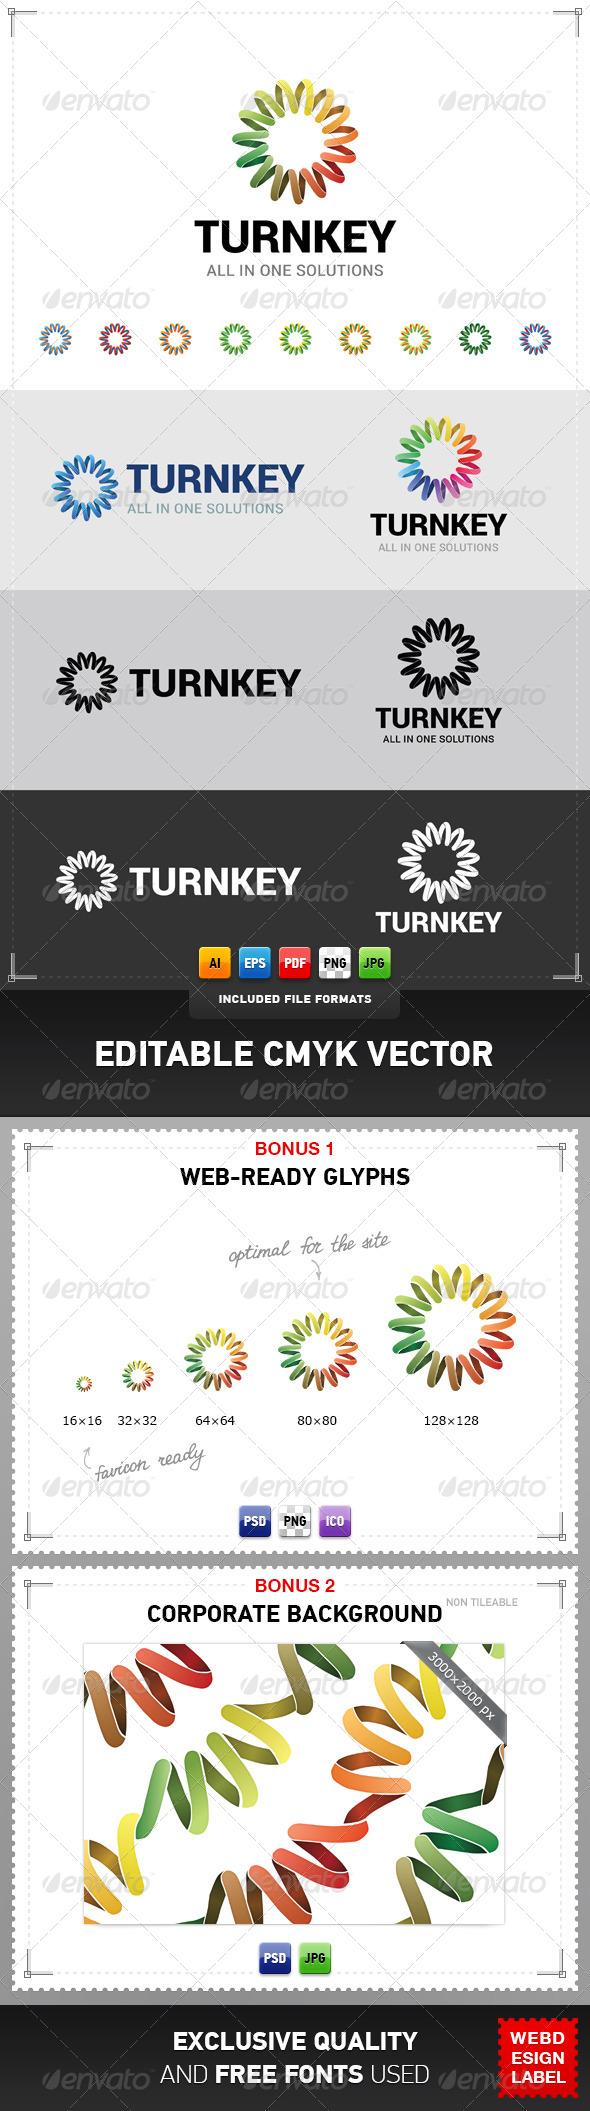 GraphicRiver Turnkey Logo 5061793